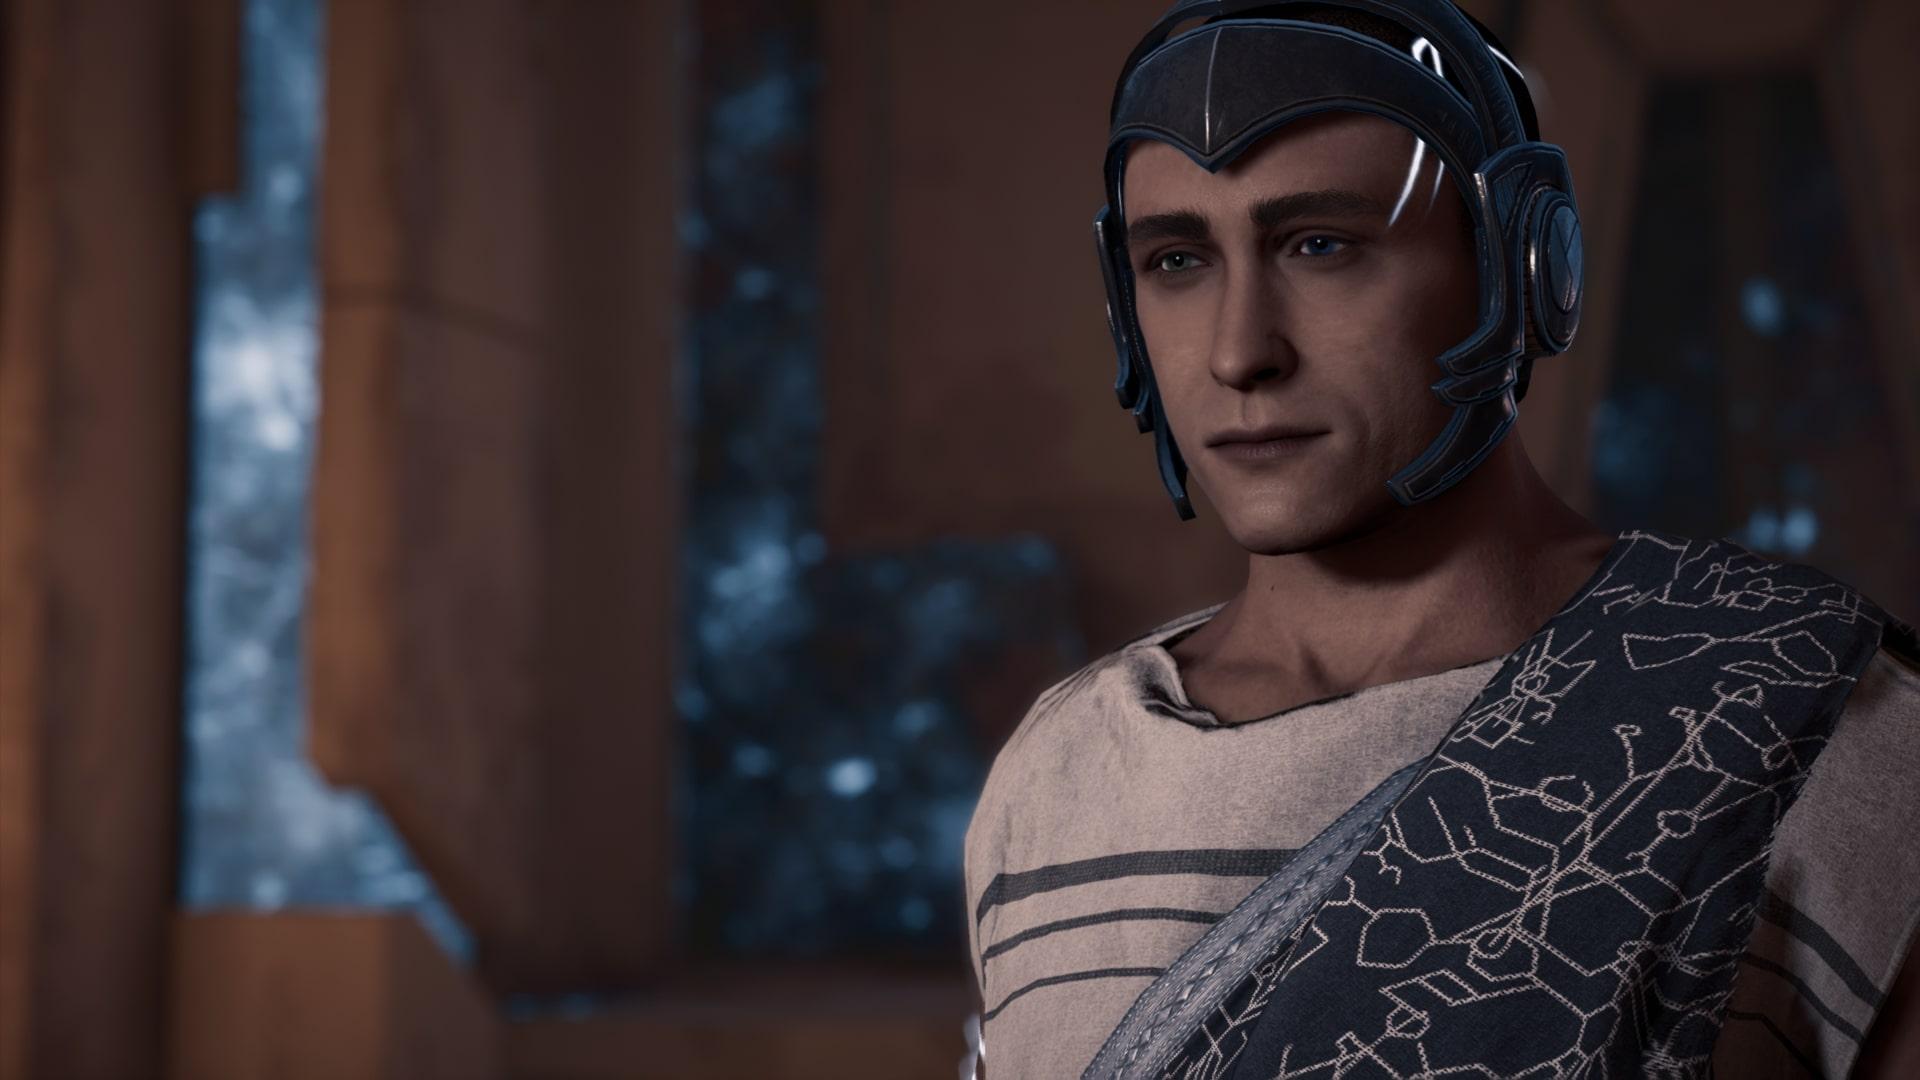 Aita Assassin's Creed : La civilisation Isu